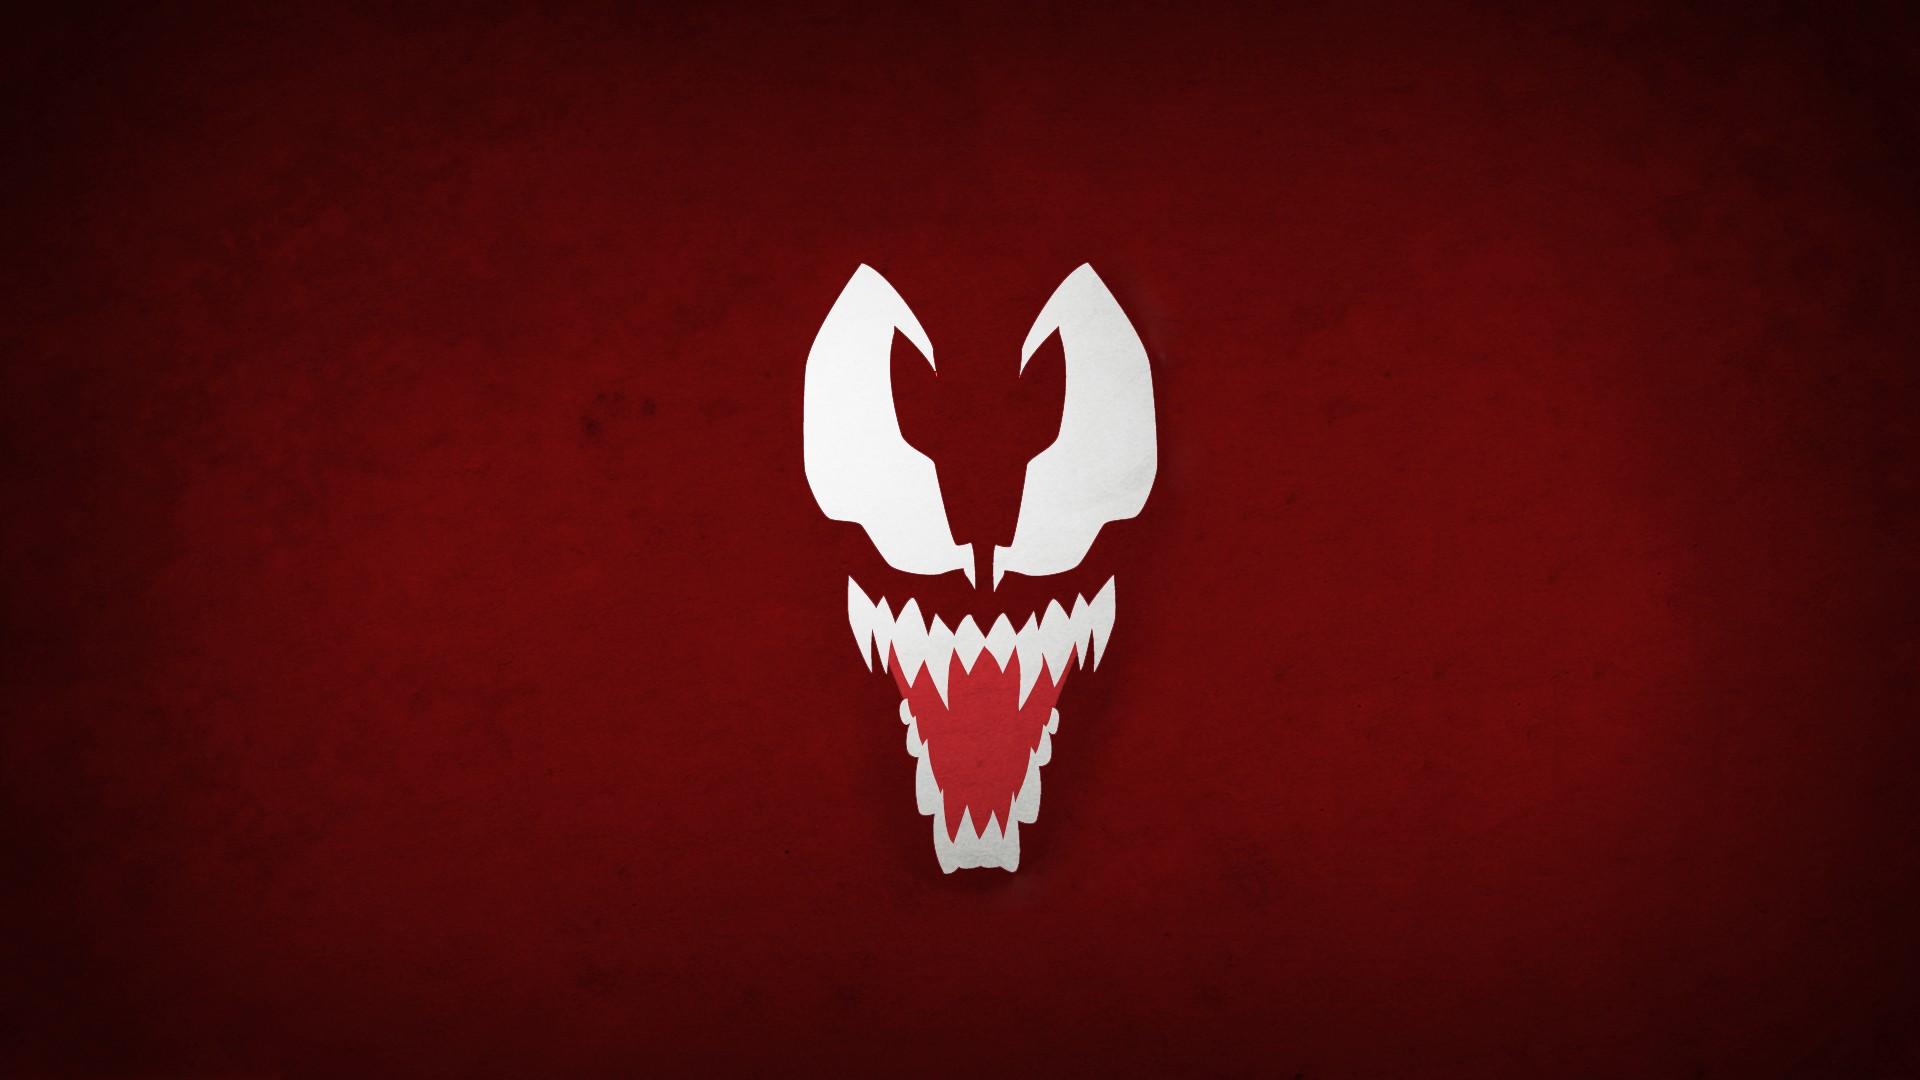 Venom HD Wallpaper Background Image 1920x1080 ID384613 1920x1080